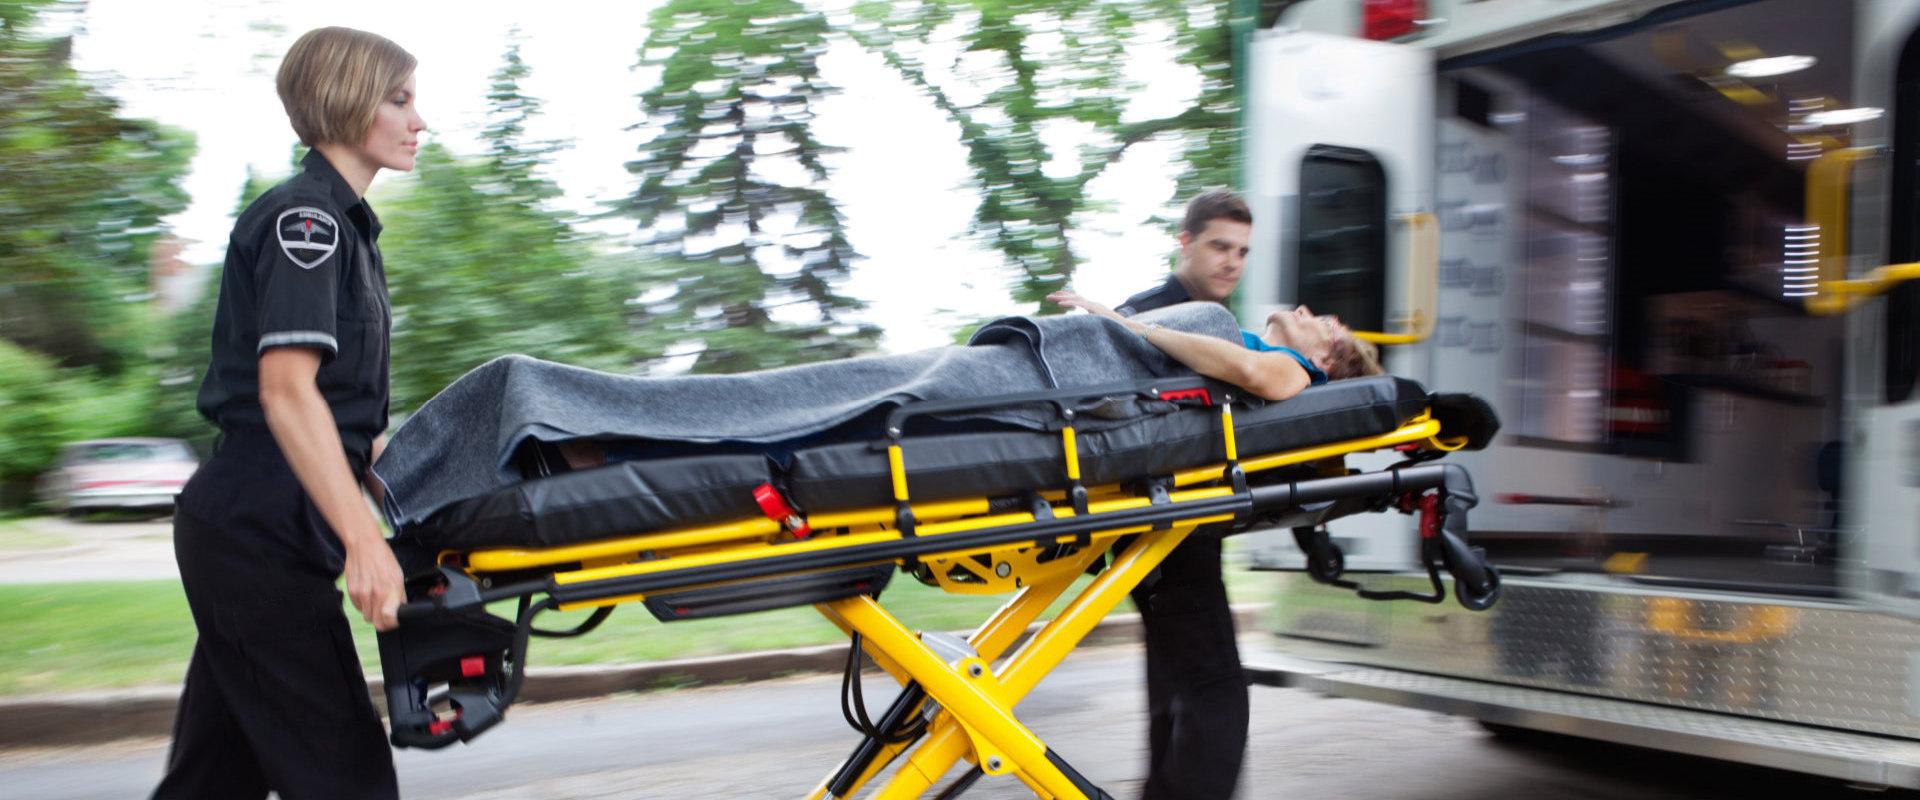 Advantage Medical Transportation